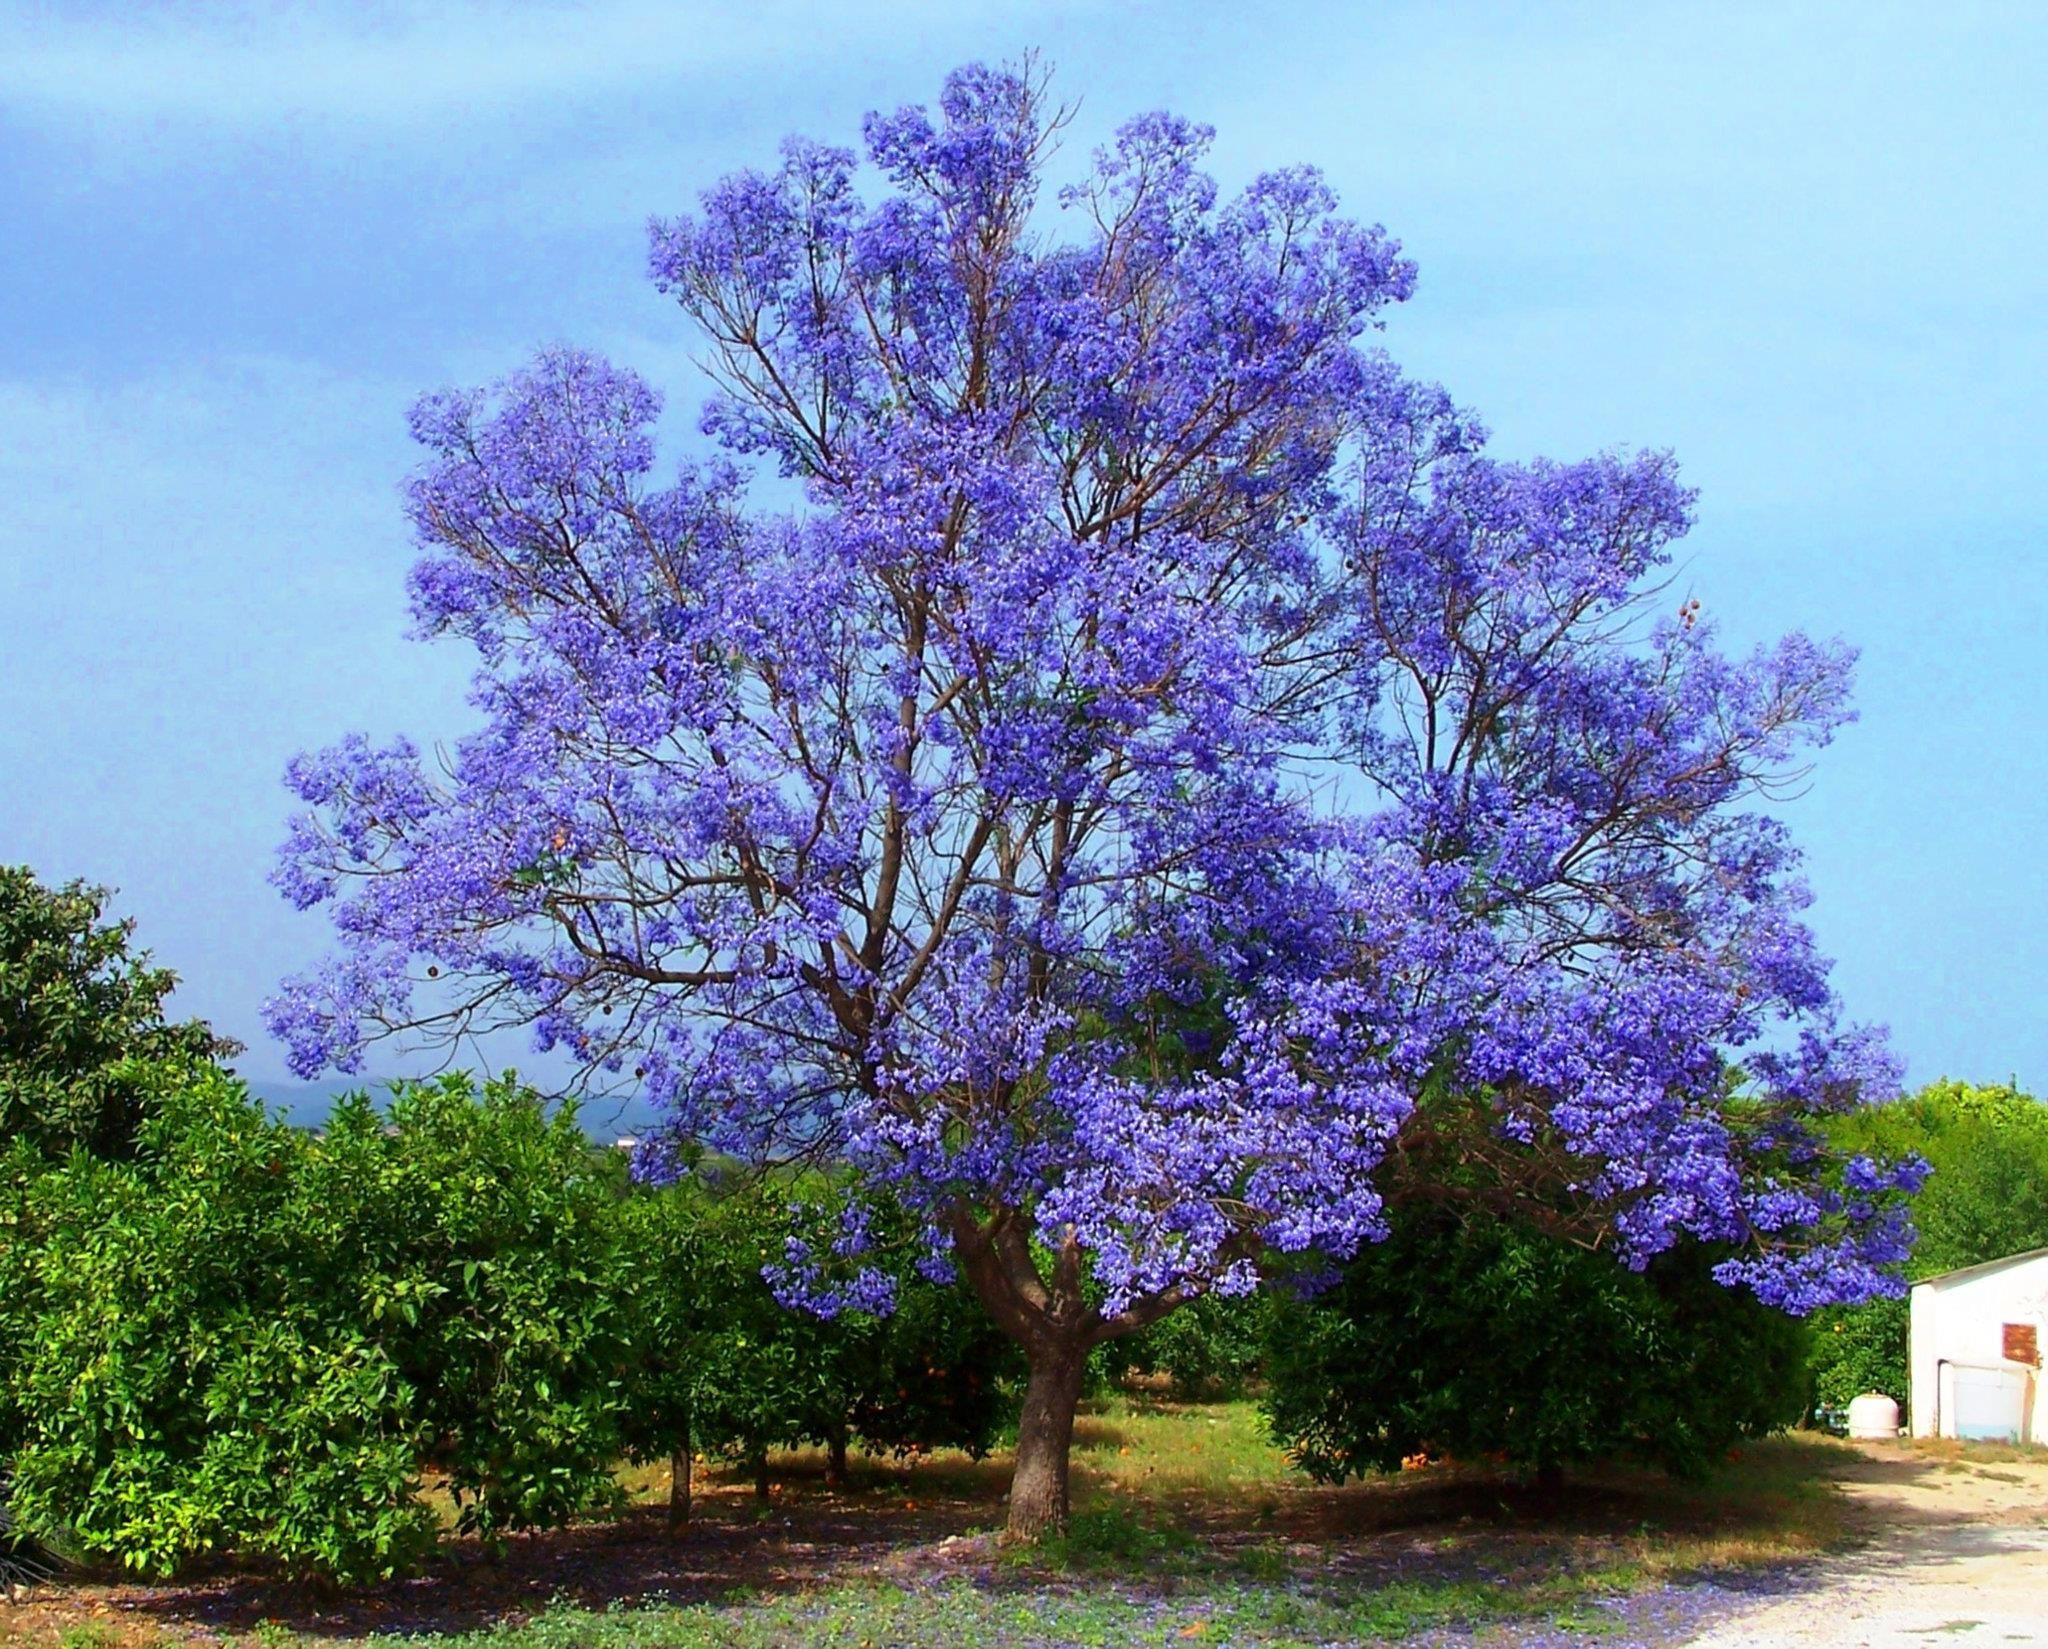 Jacaranda tree native of brazil from our beautiful world blue jacaranda tree 1 of the most popular trees people love to grow because the fern like leaves purple flowers make them look like trees straight fairytale izmirmasajfo